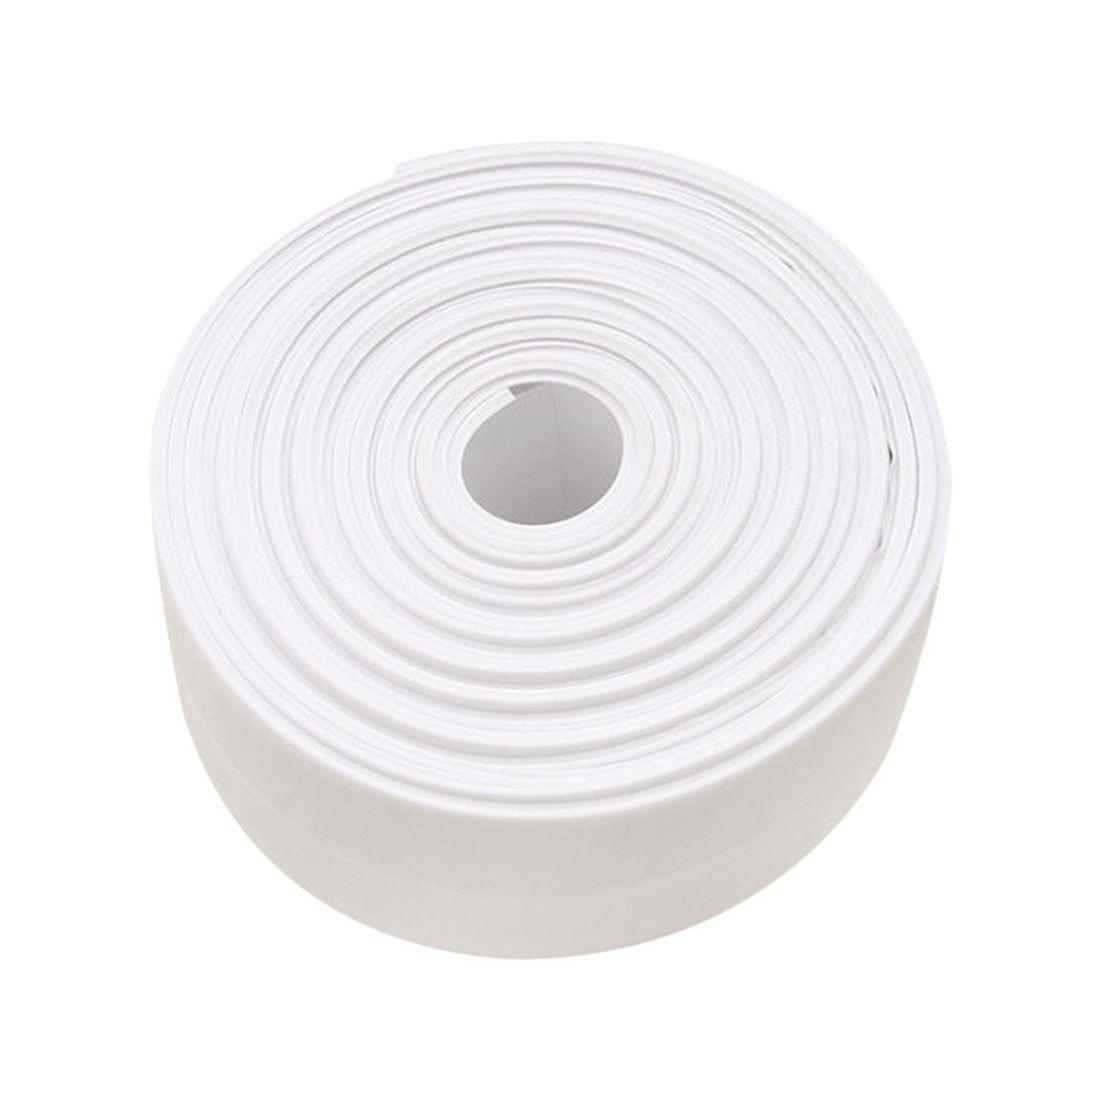 EWS-Caulk Strip, Bathroom Caulk Strips, Self Adhesive Tub Caulk Strip Wall Sealing Tape Caulk Sealer, 1-1/2 inch x 10.5 FT (38